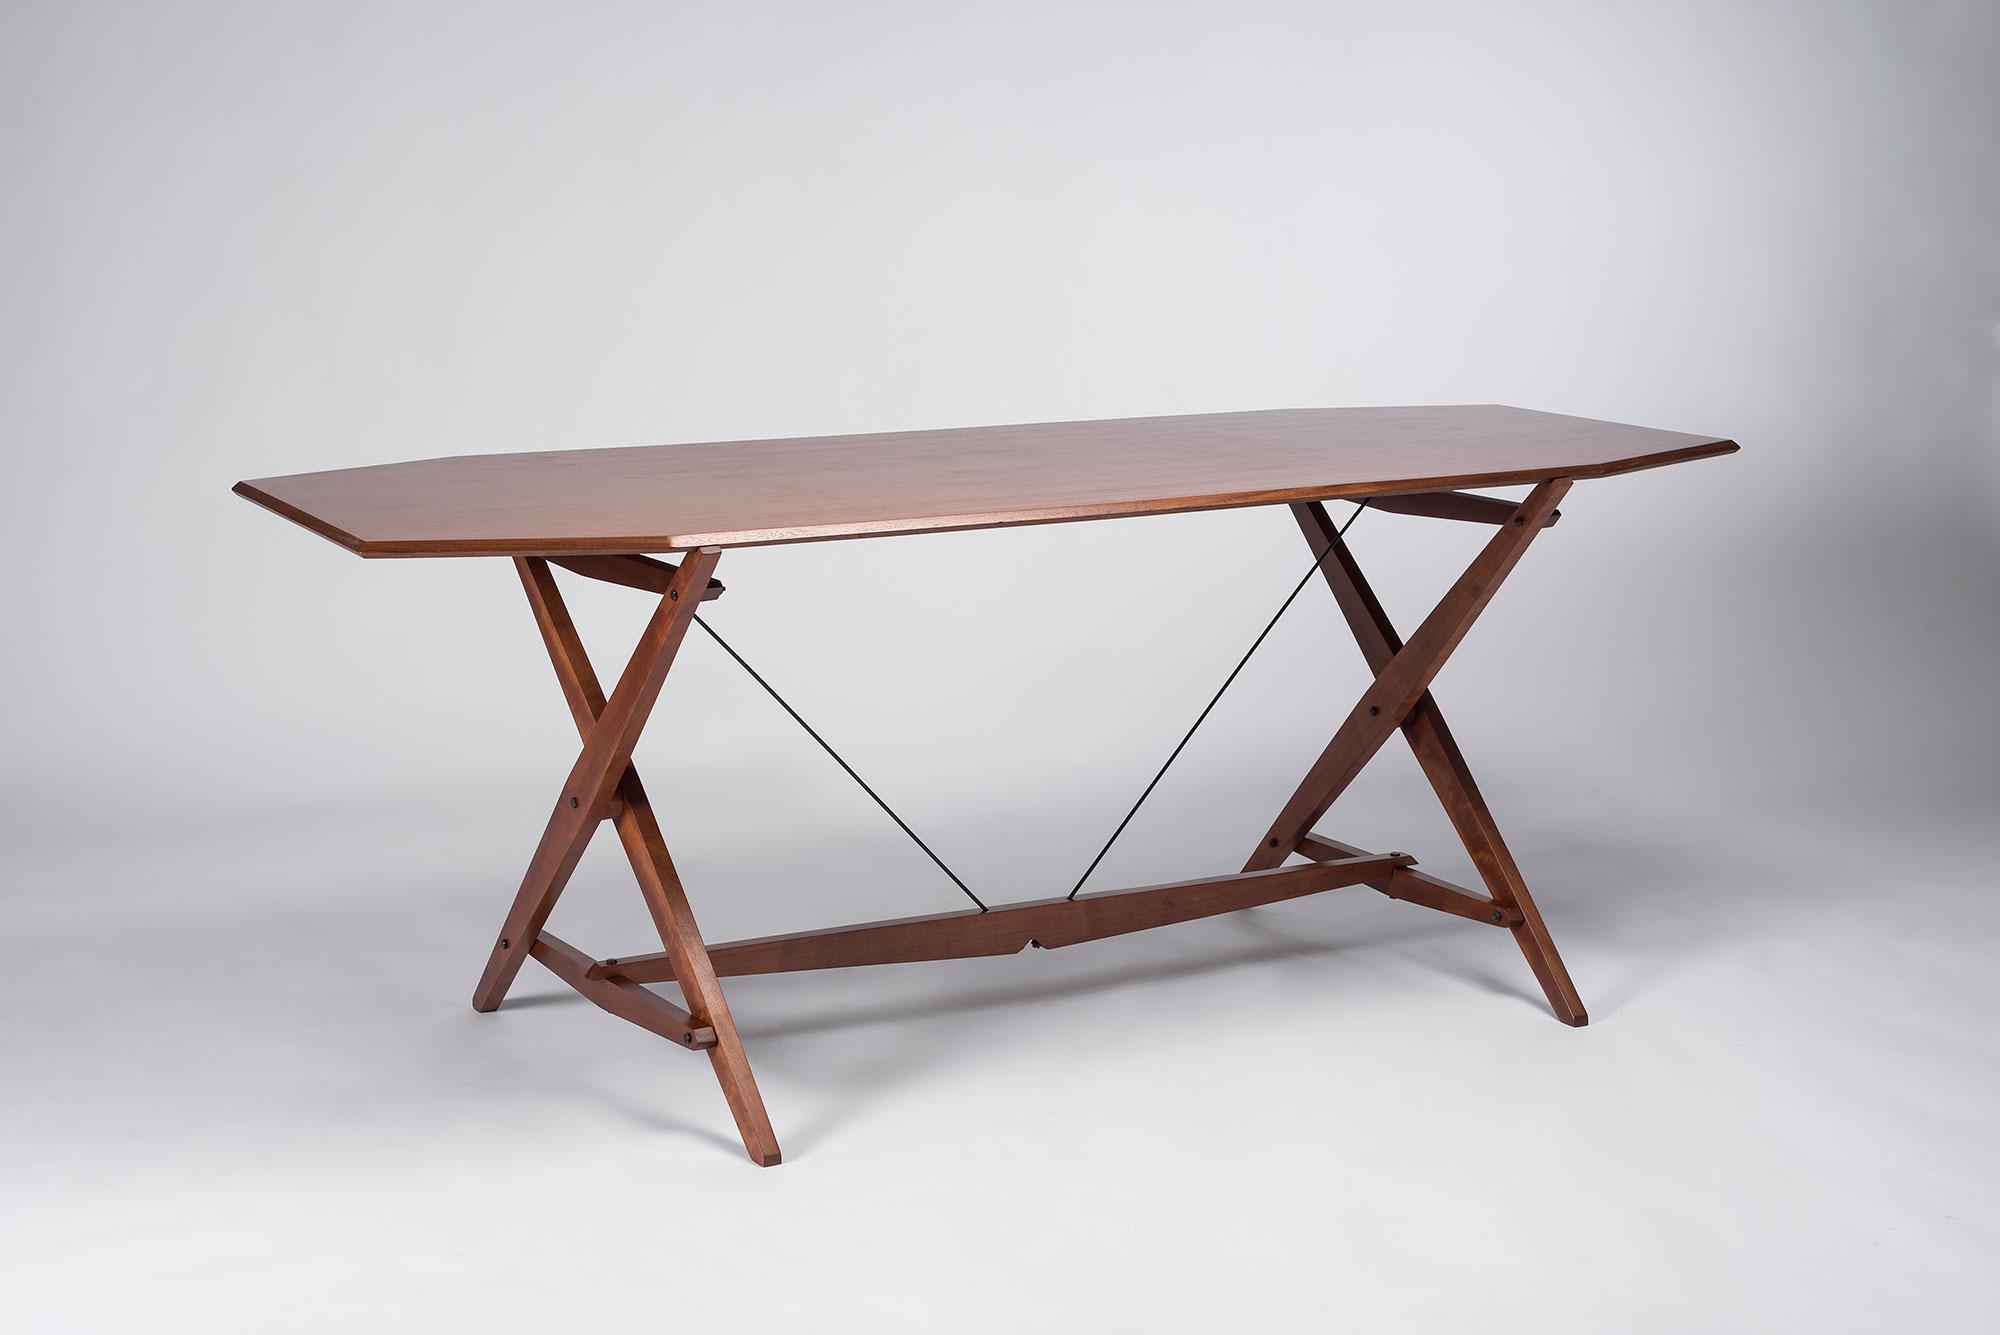 Franco Albini |  TL2 table